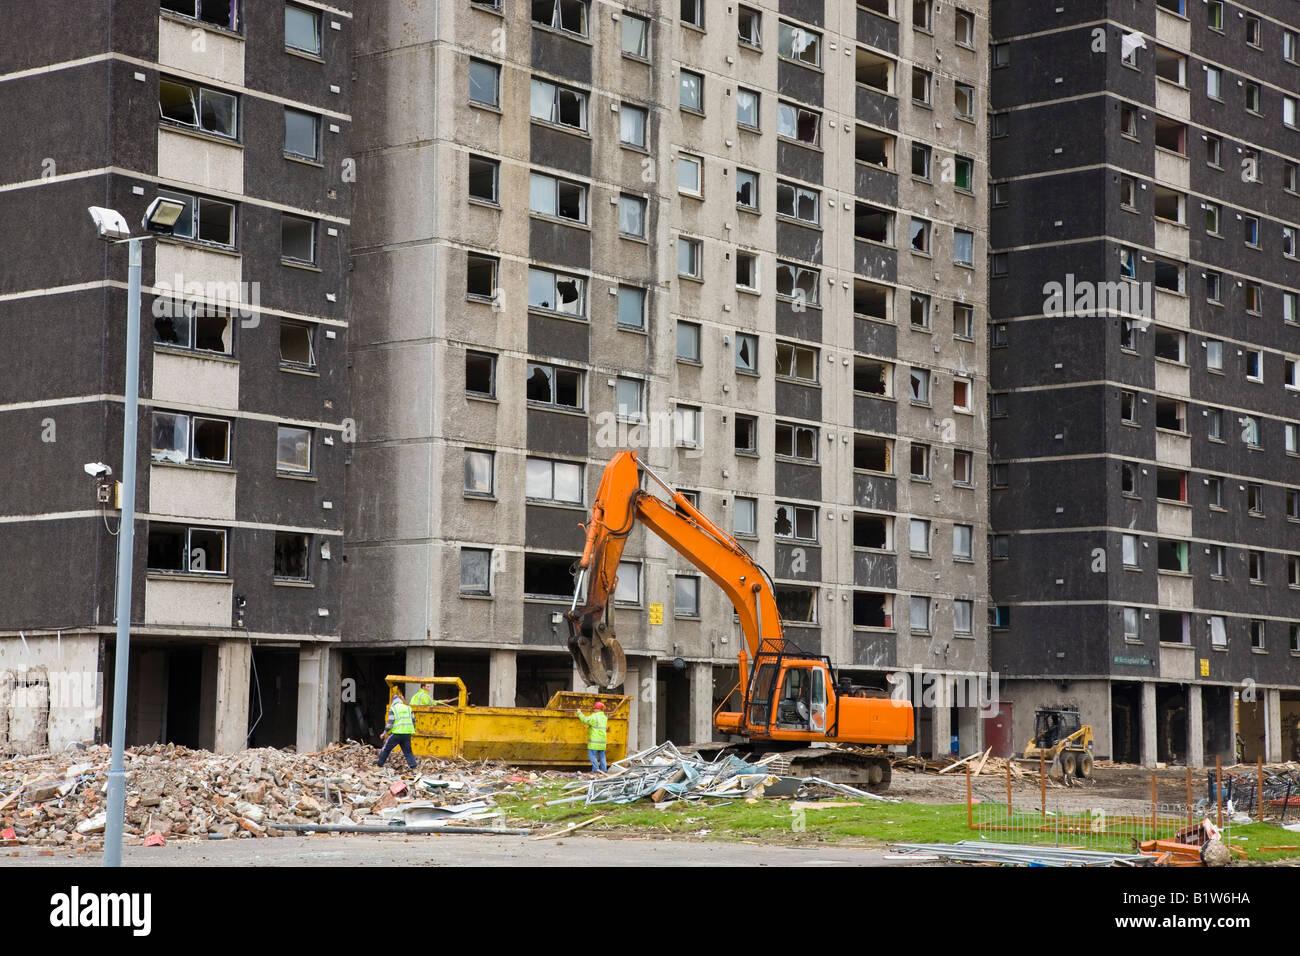 Demolition of multistorey flats in Gorbals Glasgow Scotland Stock Photo